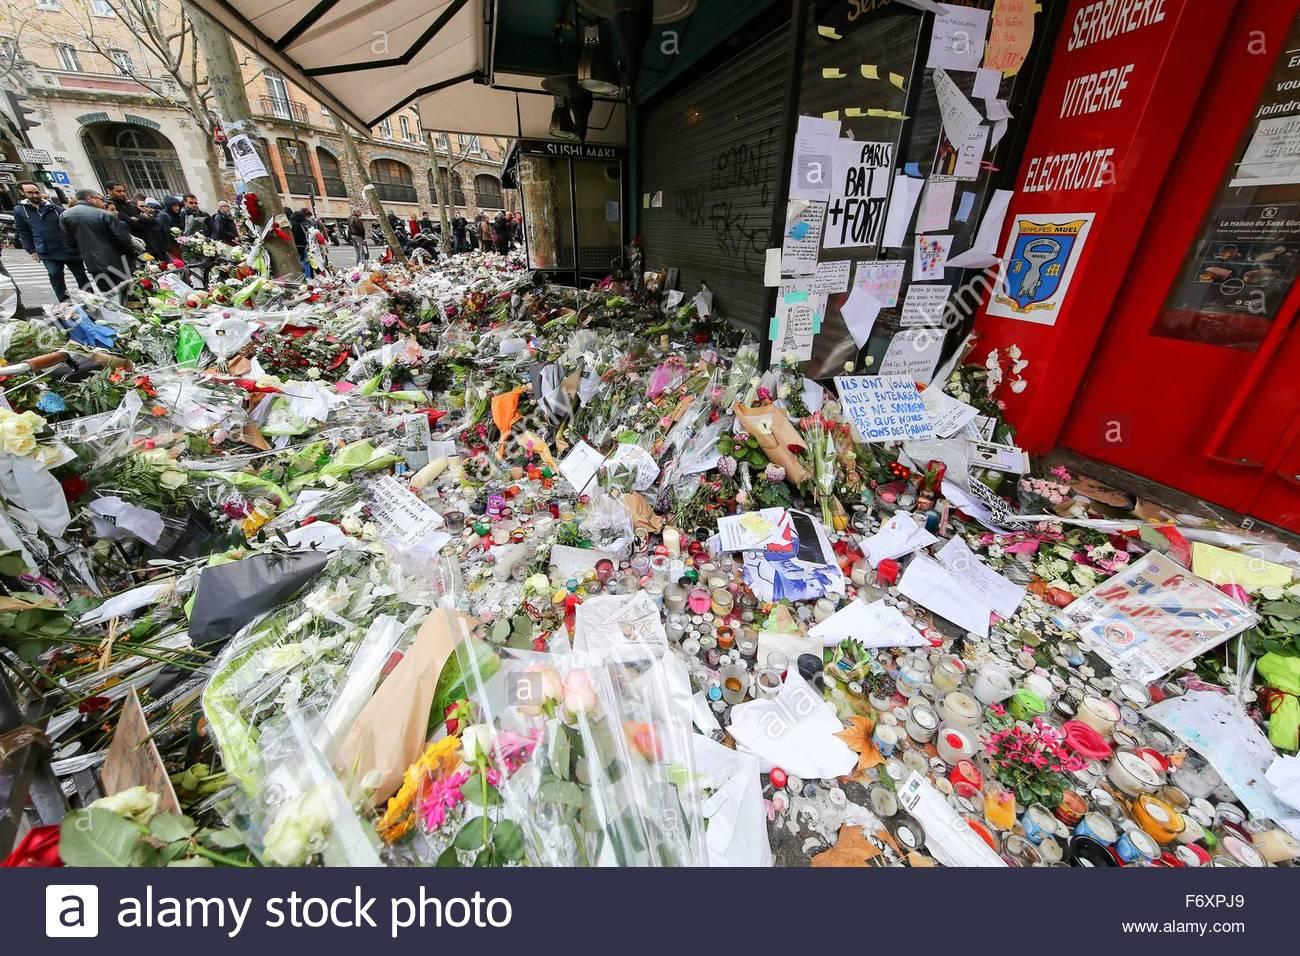 Paris, France. novembre 21st, 2015. FRANCE, Paris: Flowers and candles are shown near La belle Equipe cafe on November - Stock Image